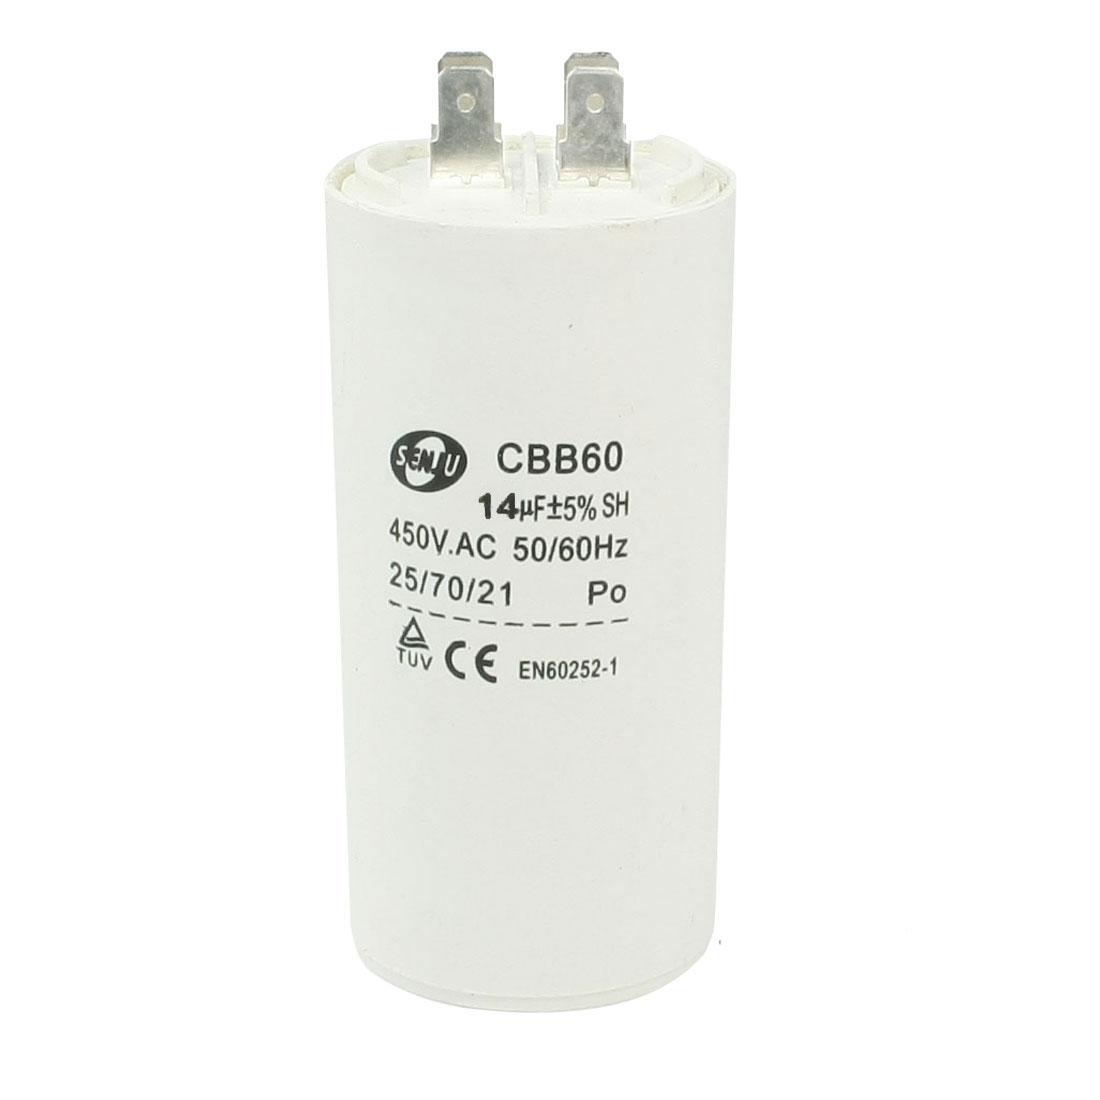 Household Washers Non Polar Motor Capacitor White 14UF 450VAC CBB60